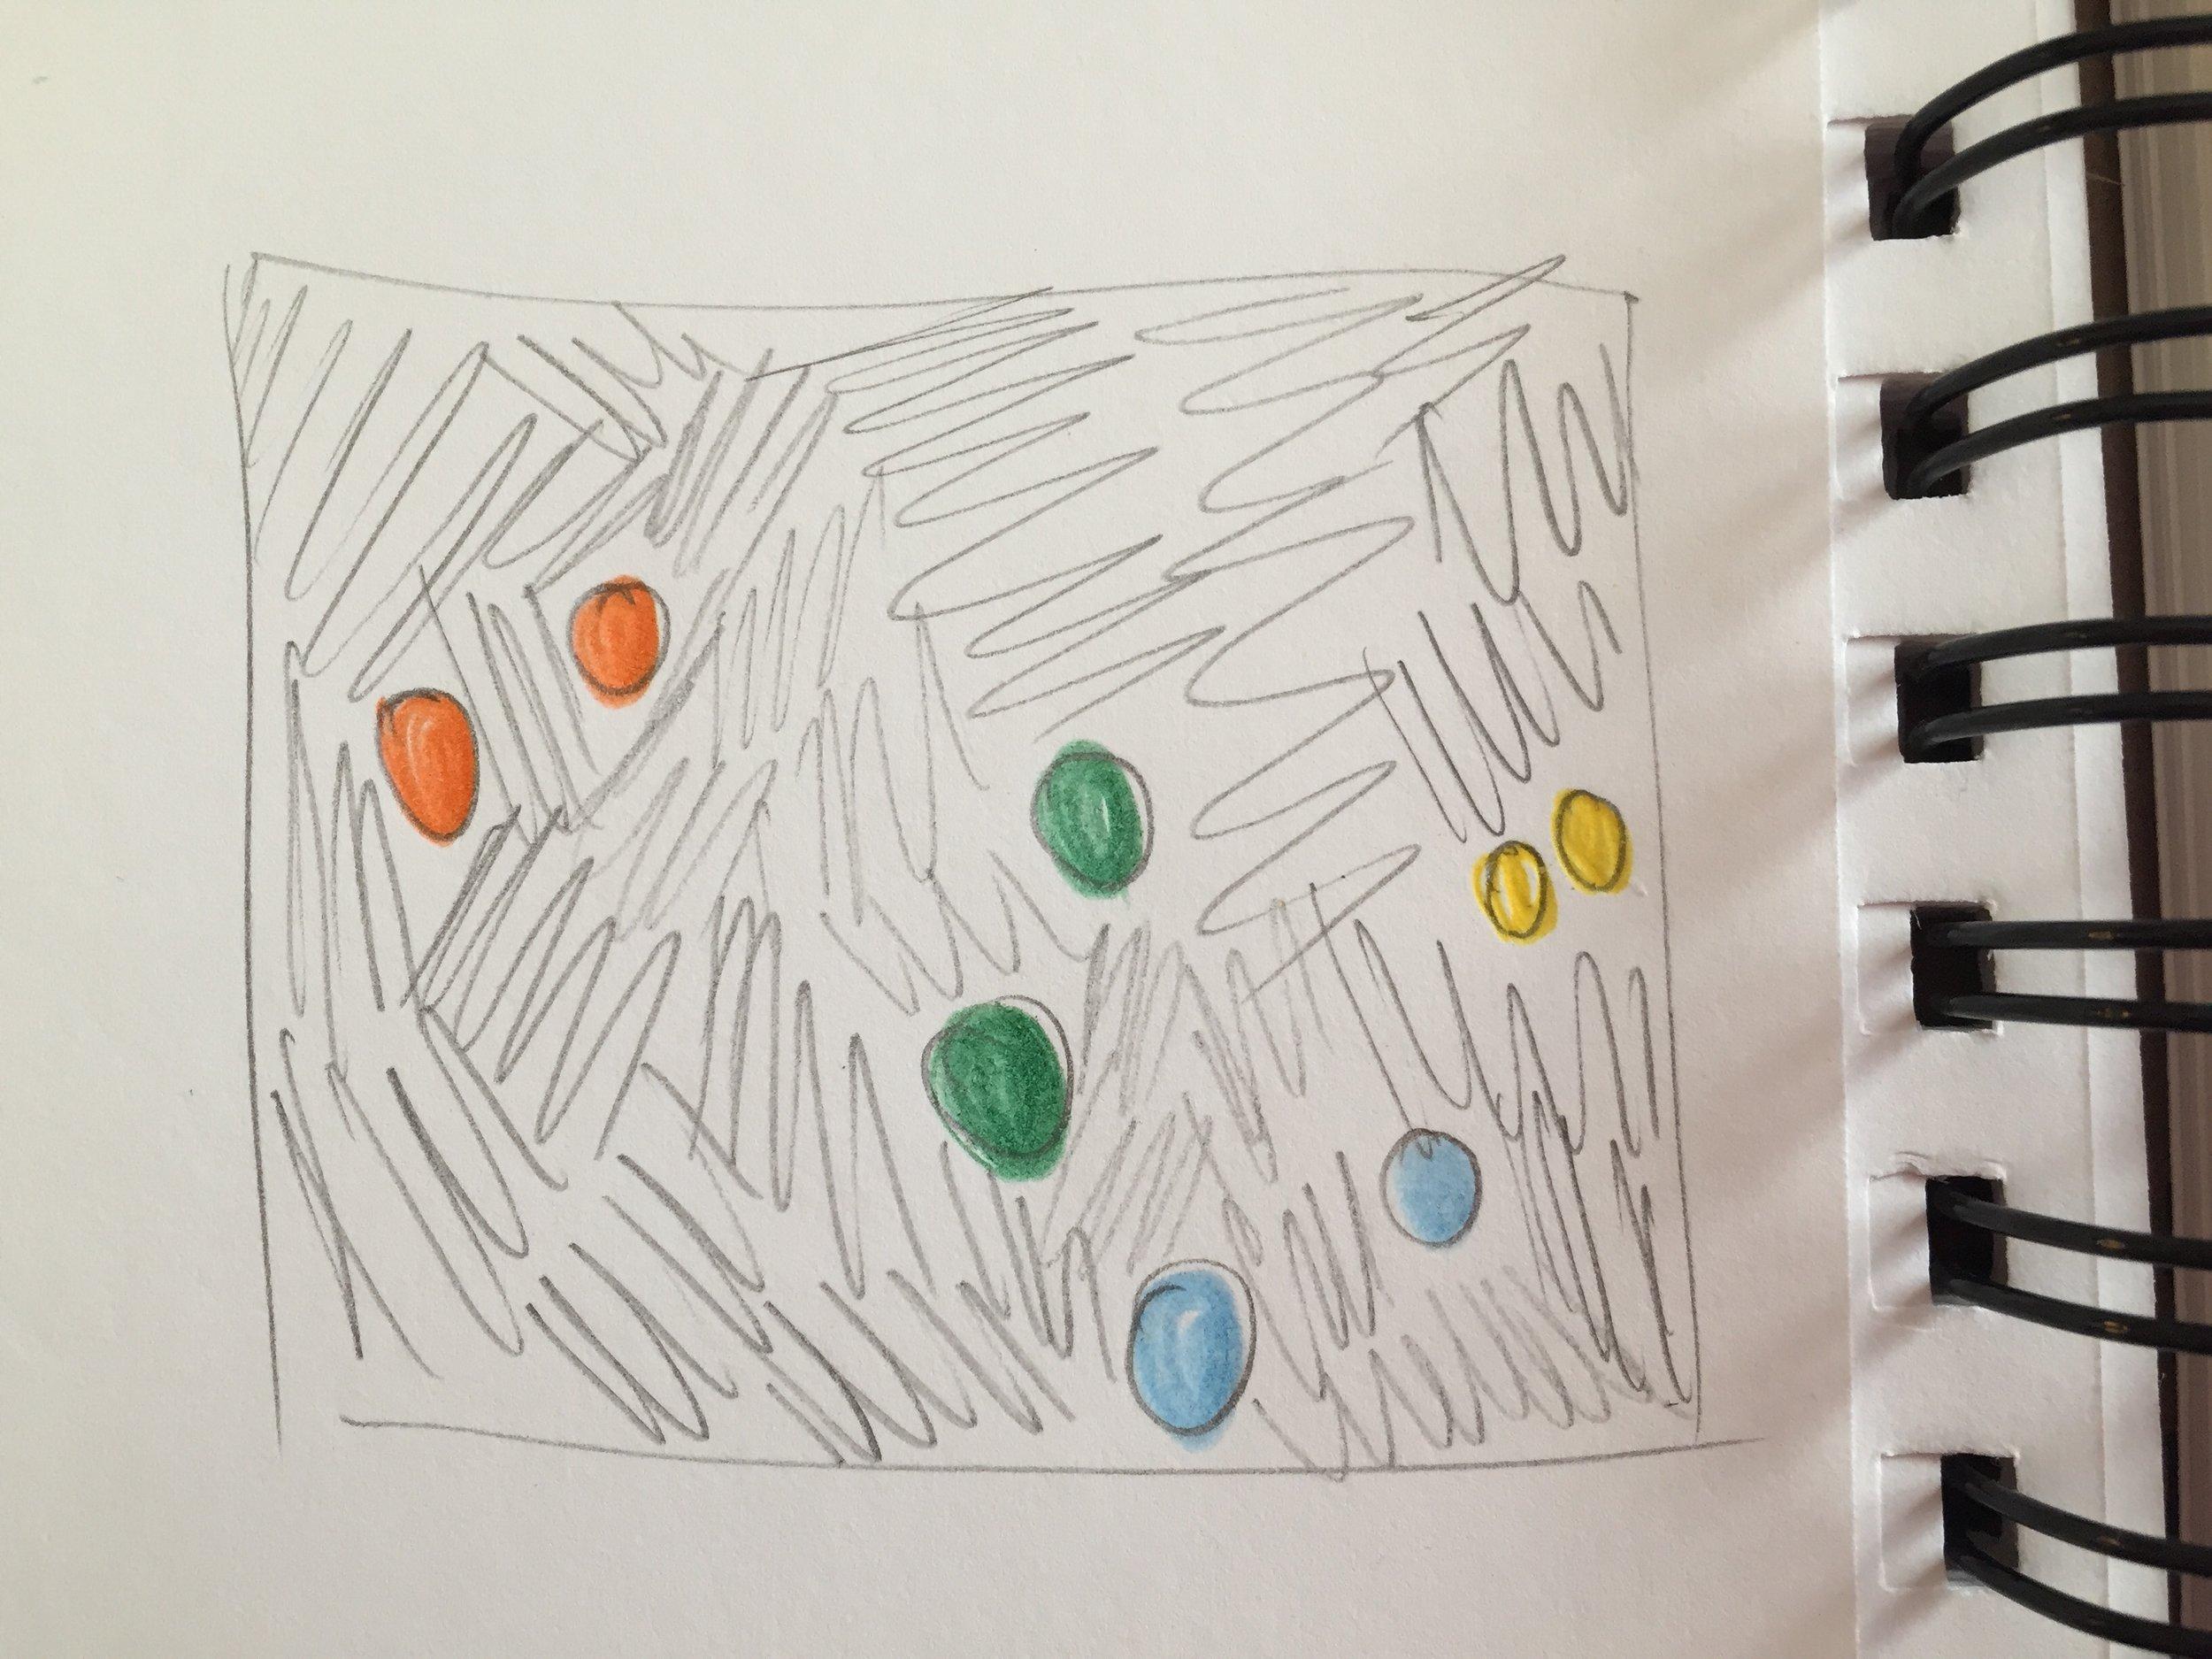 Other sketch.jpg